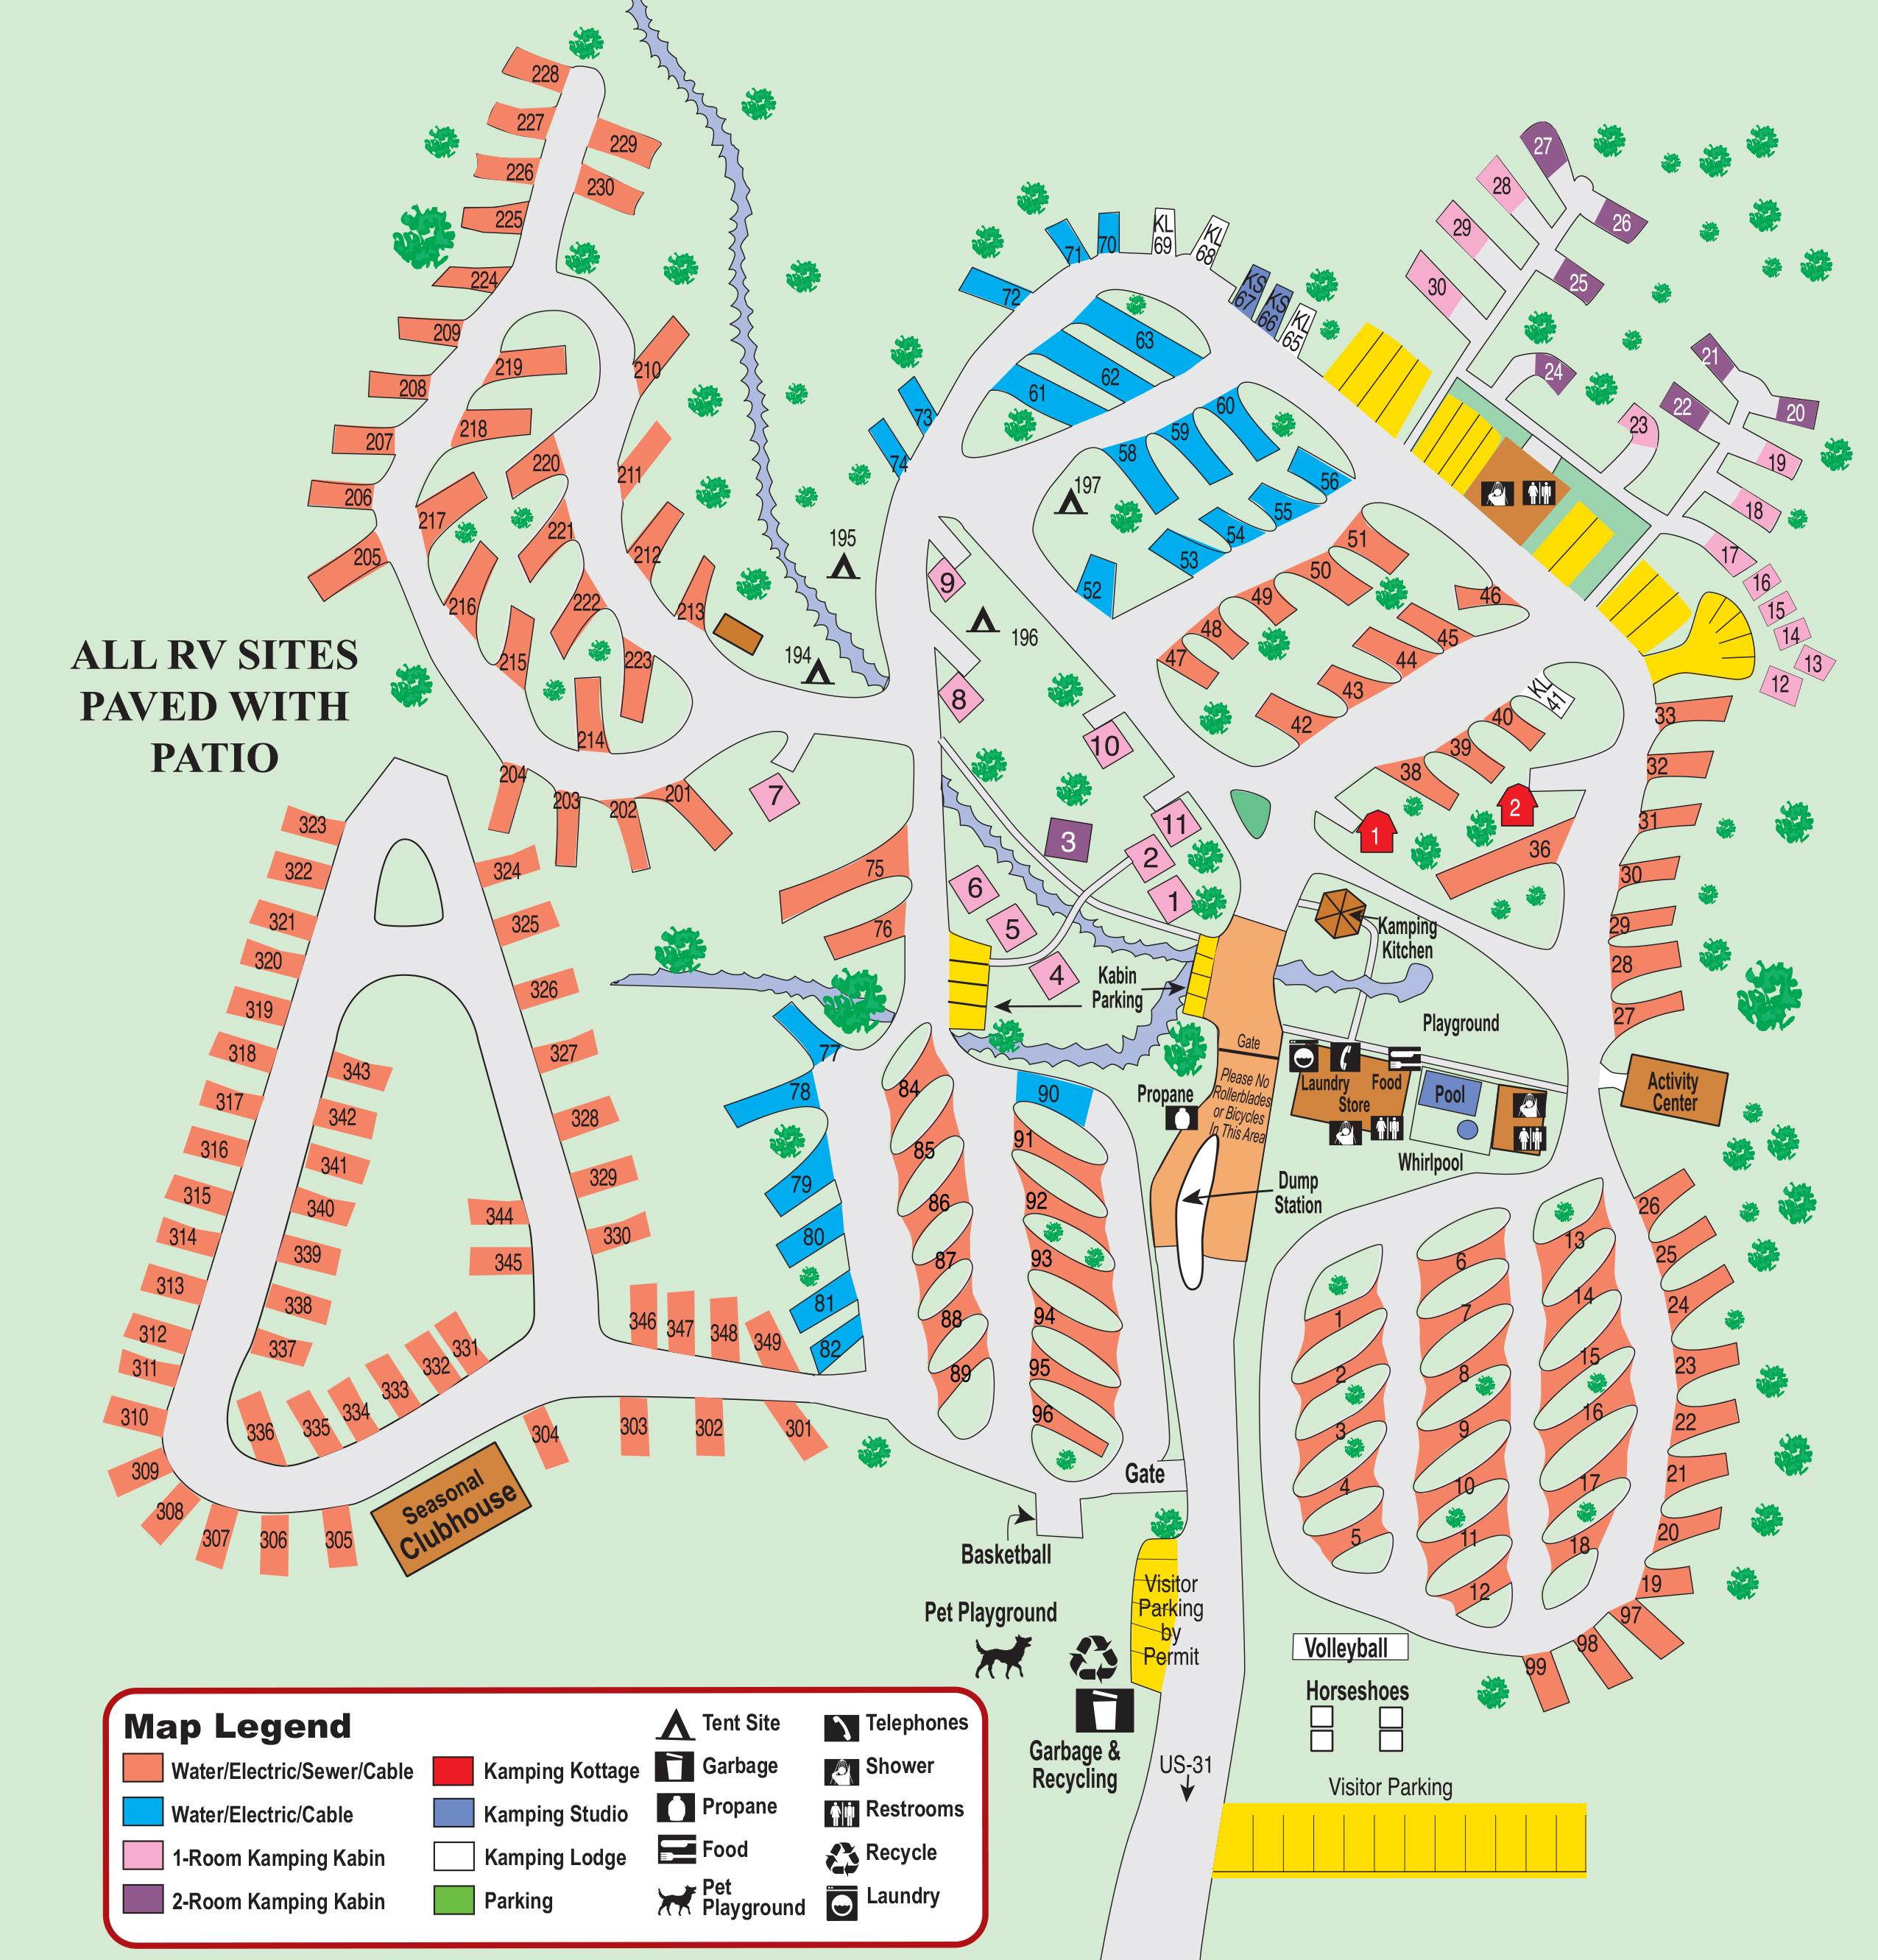 koa cgrounds california map 28 images koa cgrounds california